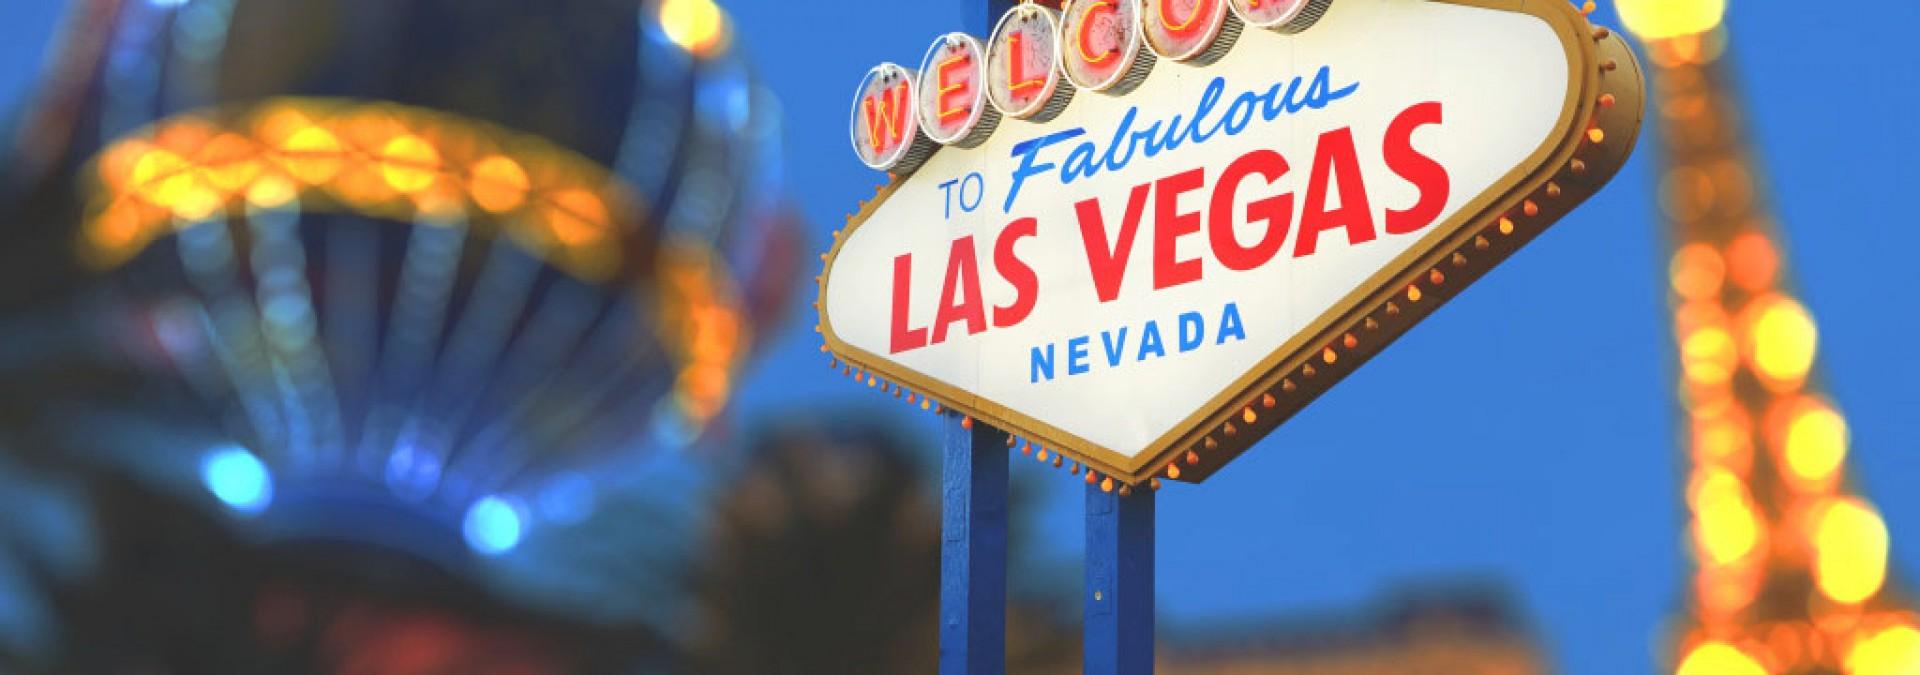 ASHP MY 2019 Las Vegas